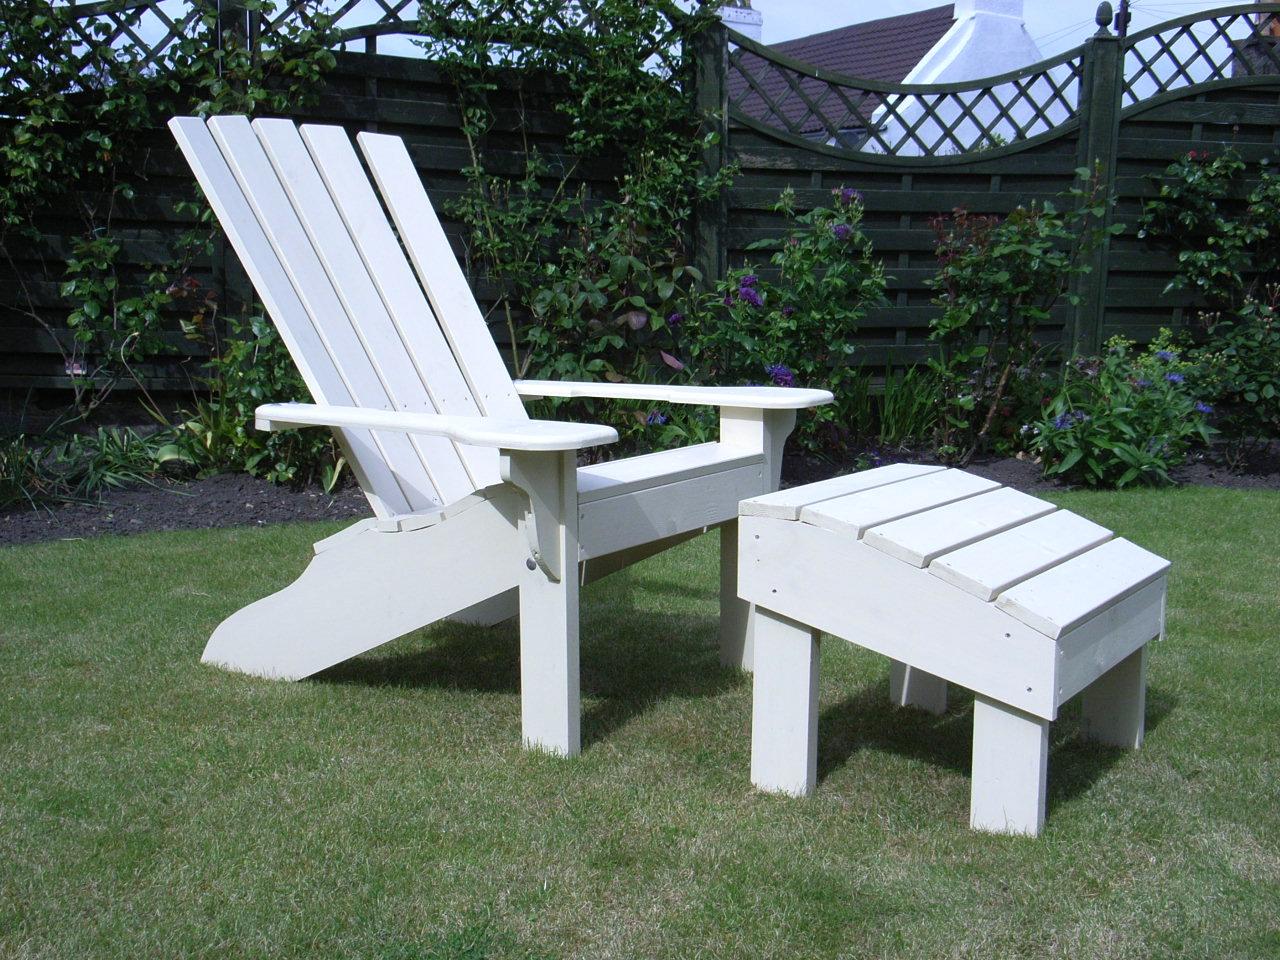 The Westport Garden Footstool Sunshine Chairs